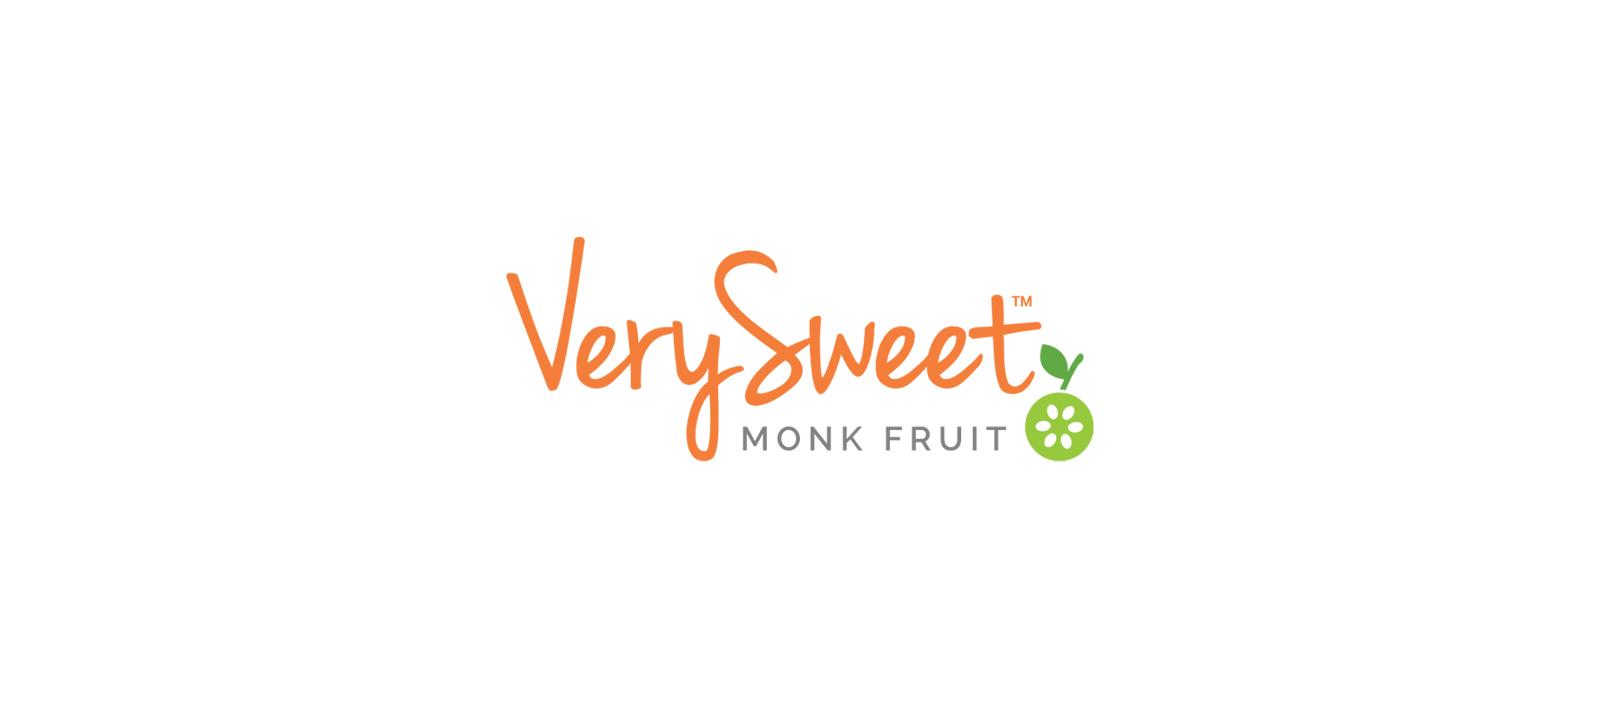 ADM VerySweet, Monk Fruit logo